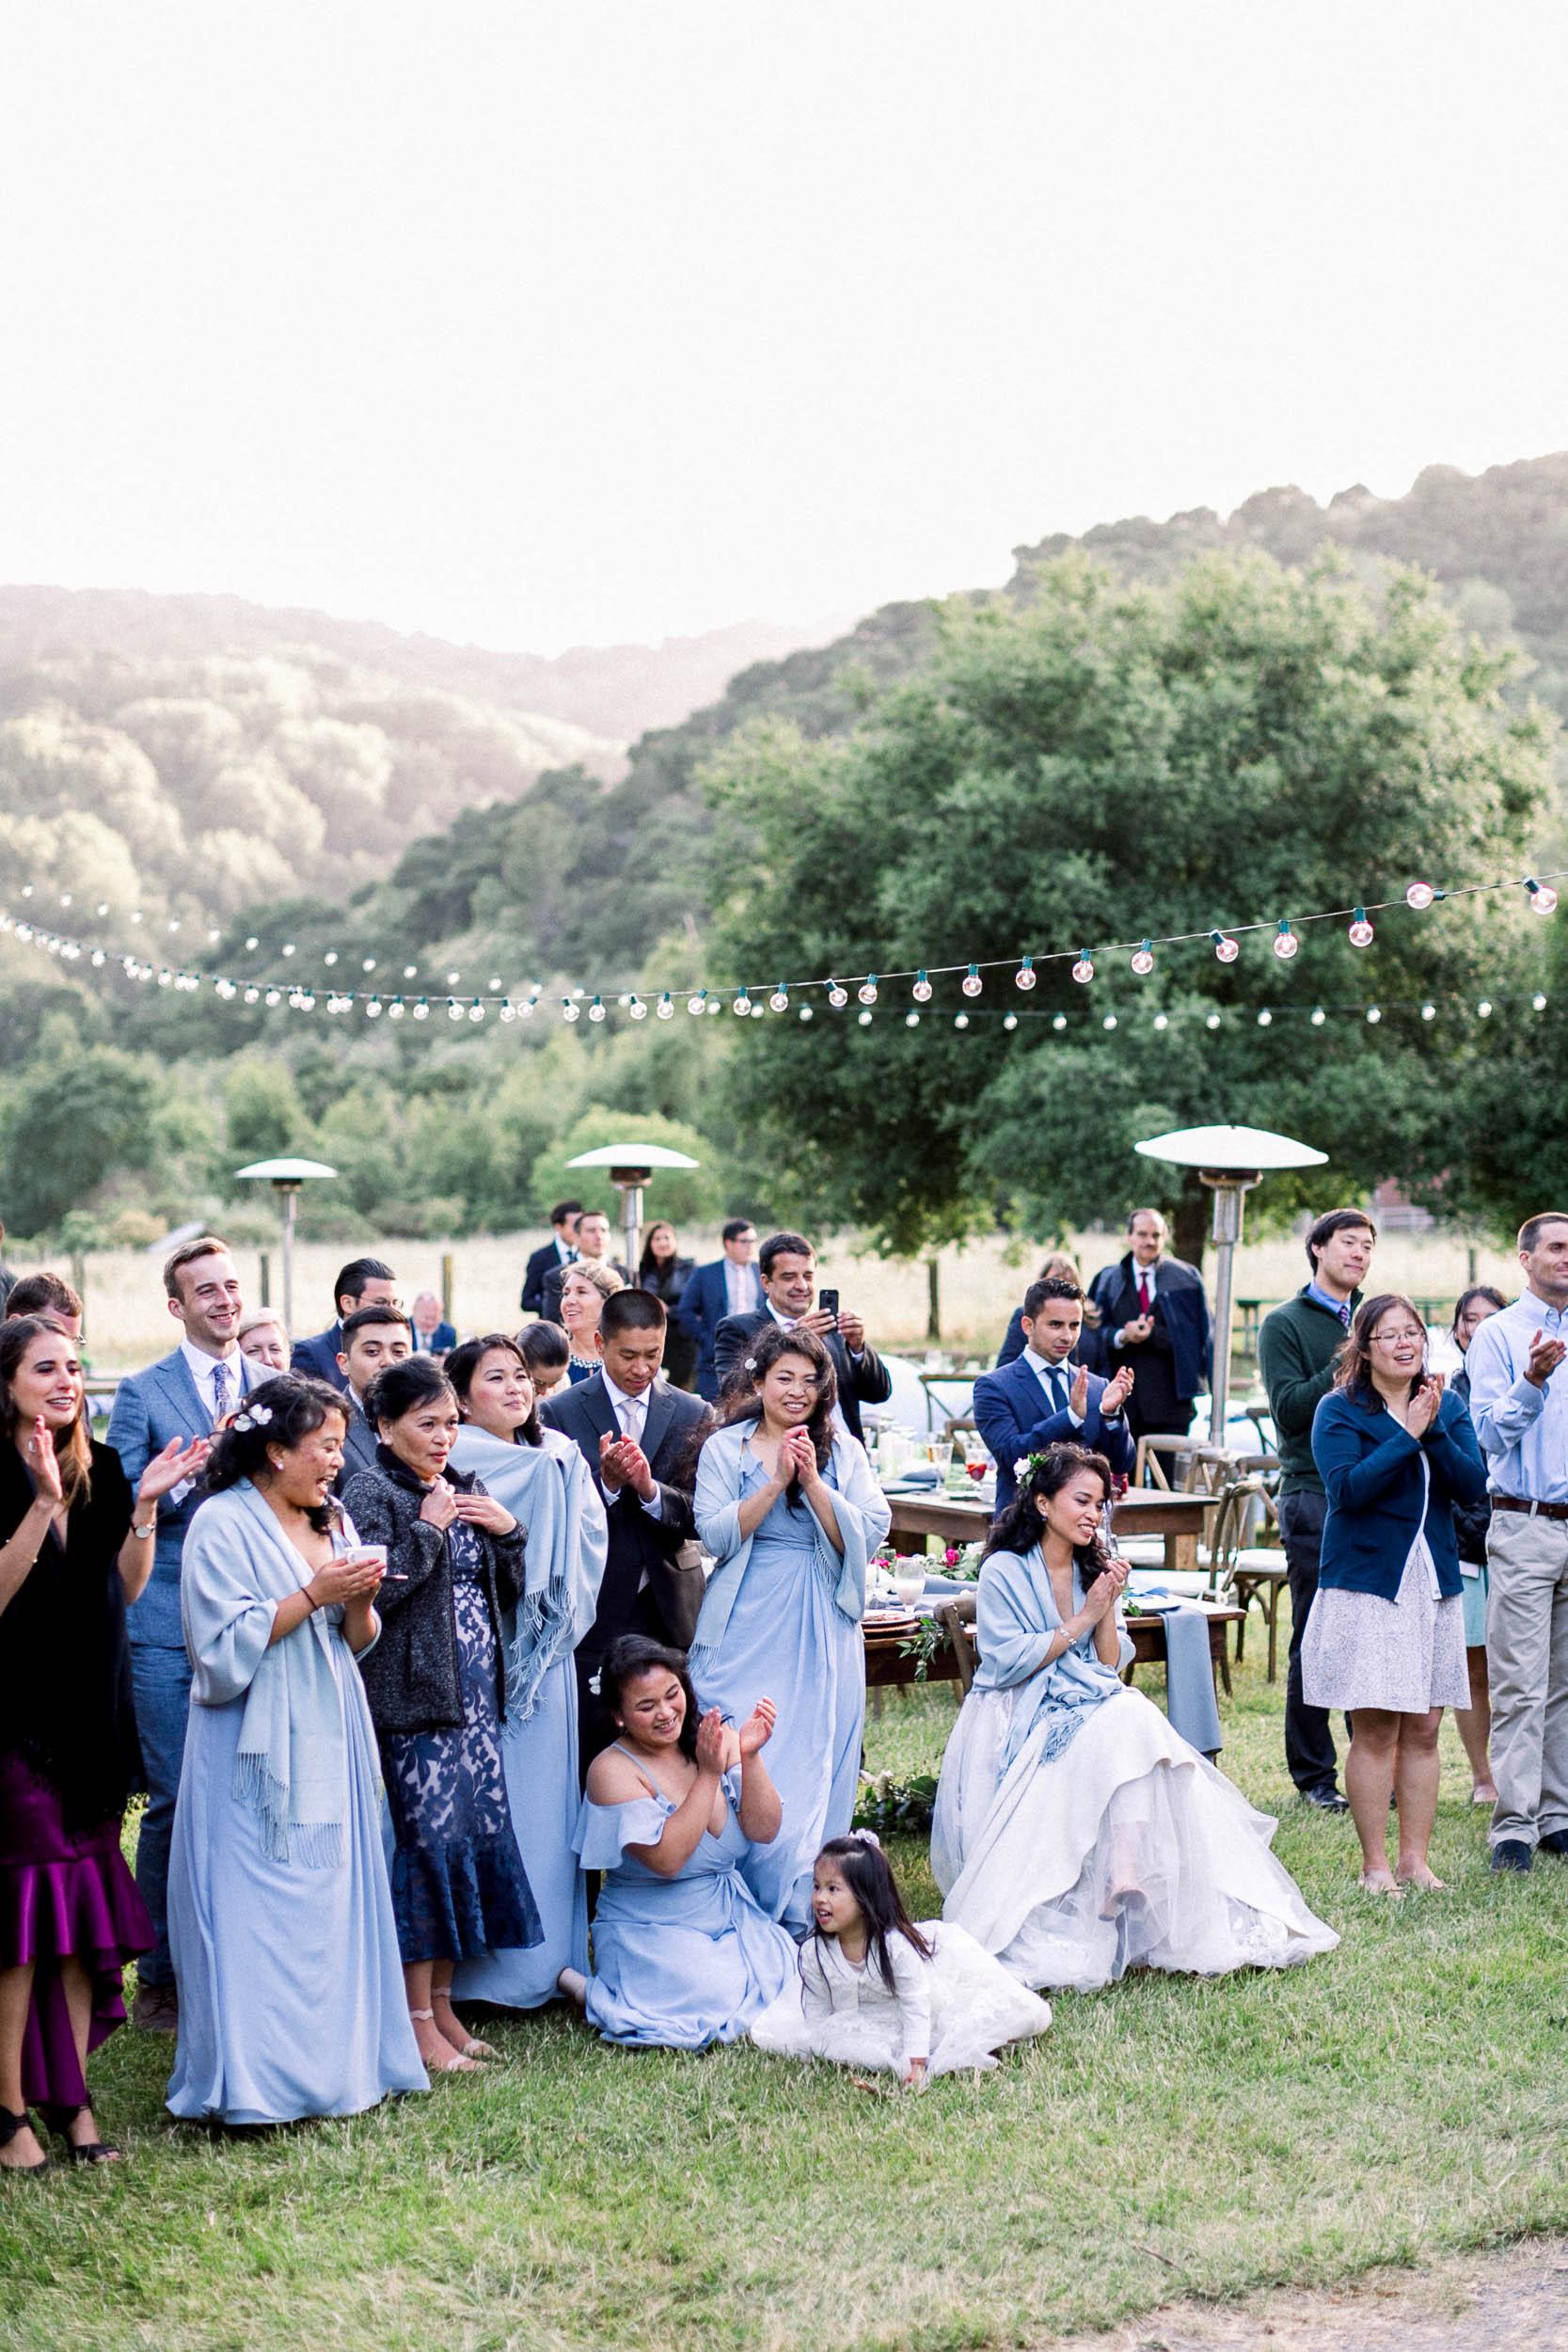 052519_B+S_Hidden Villa Wedding_Buena Lane Photography_052519_0890CY.jpg